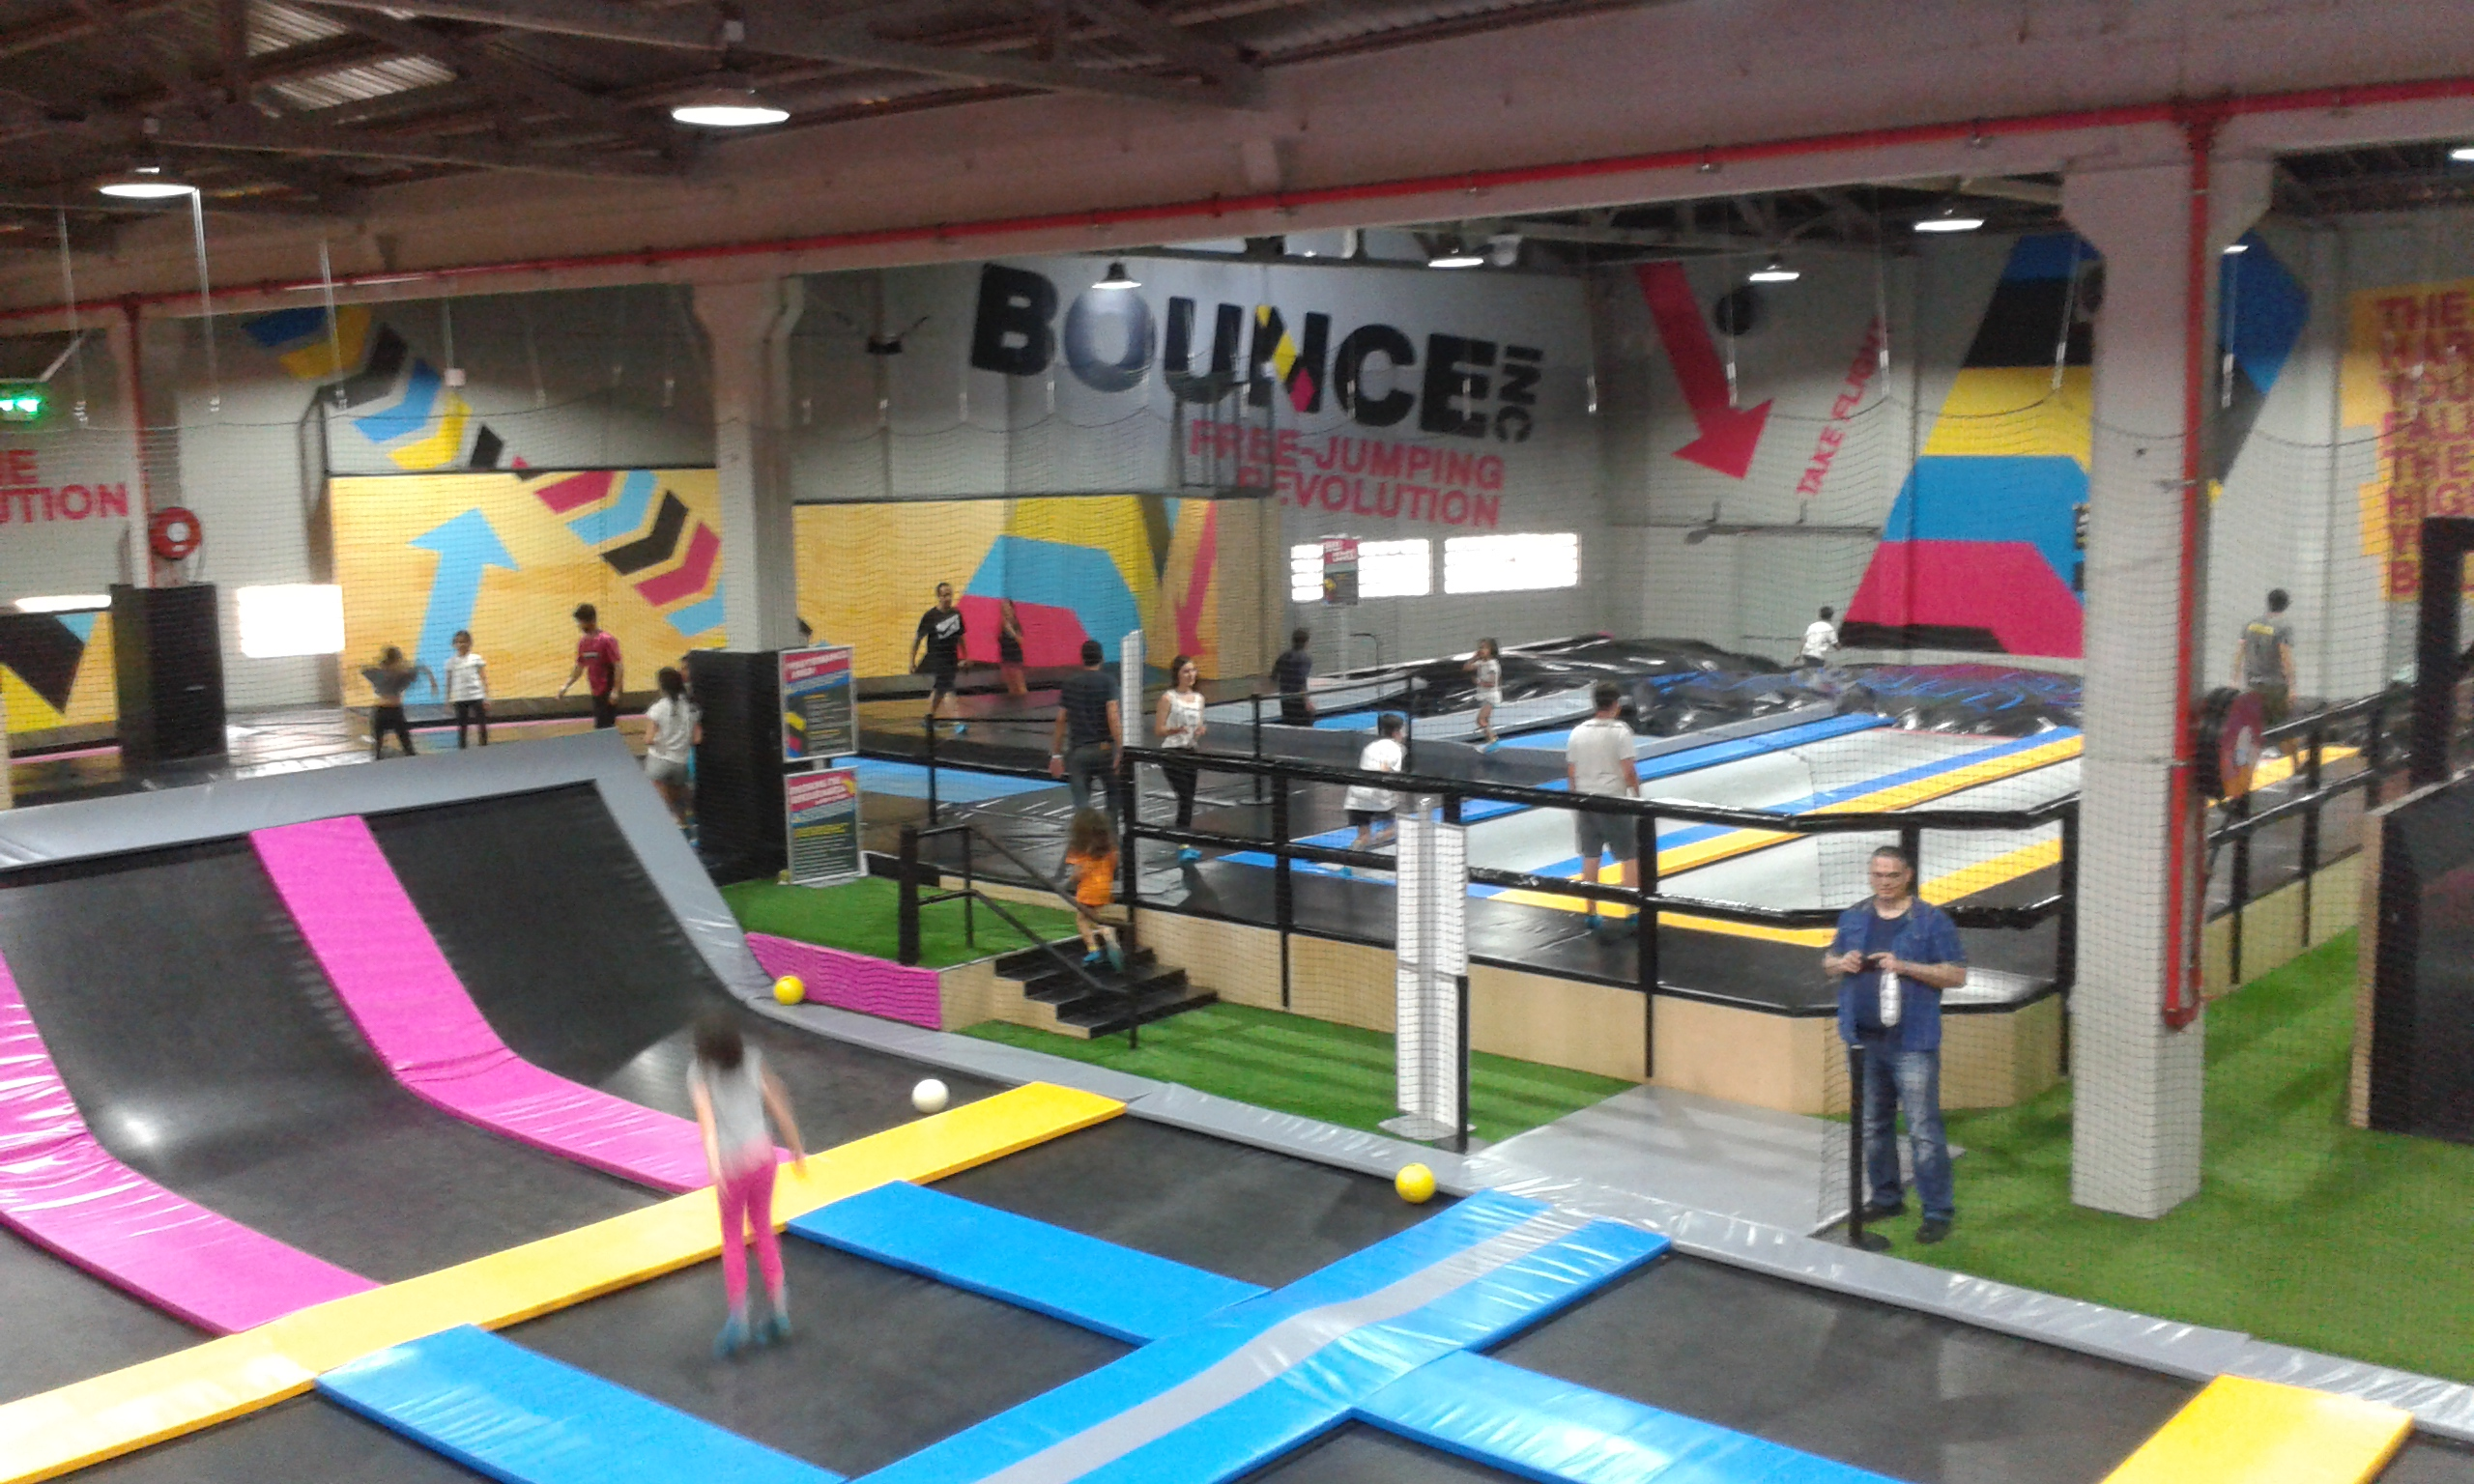 Bounce_1